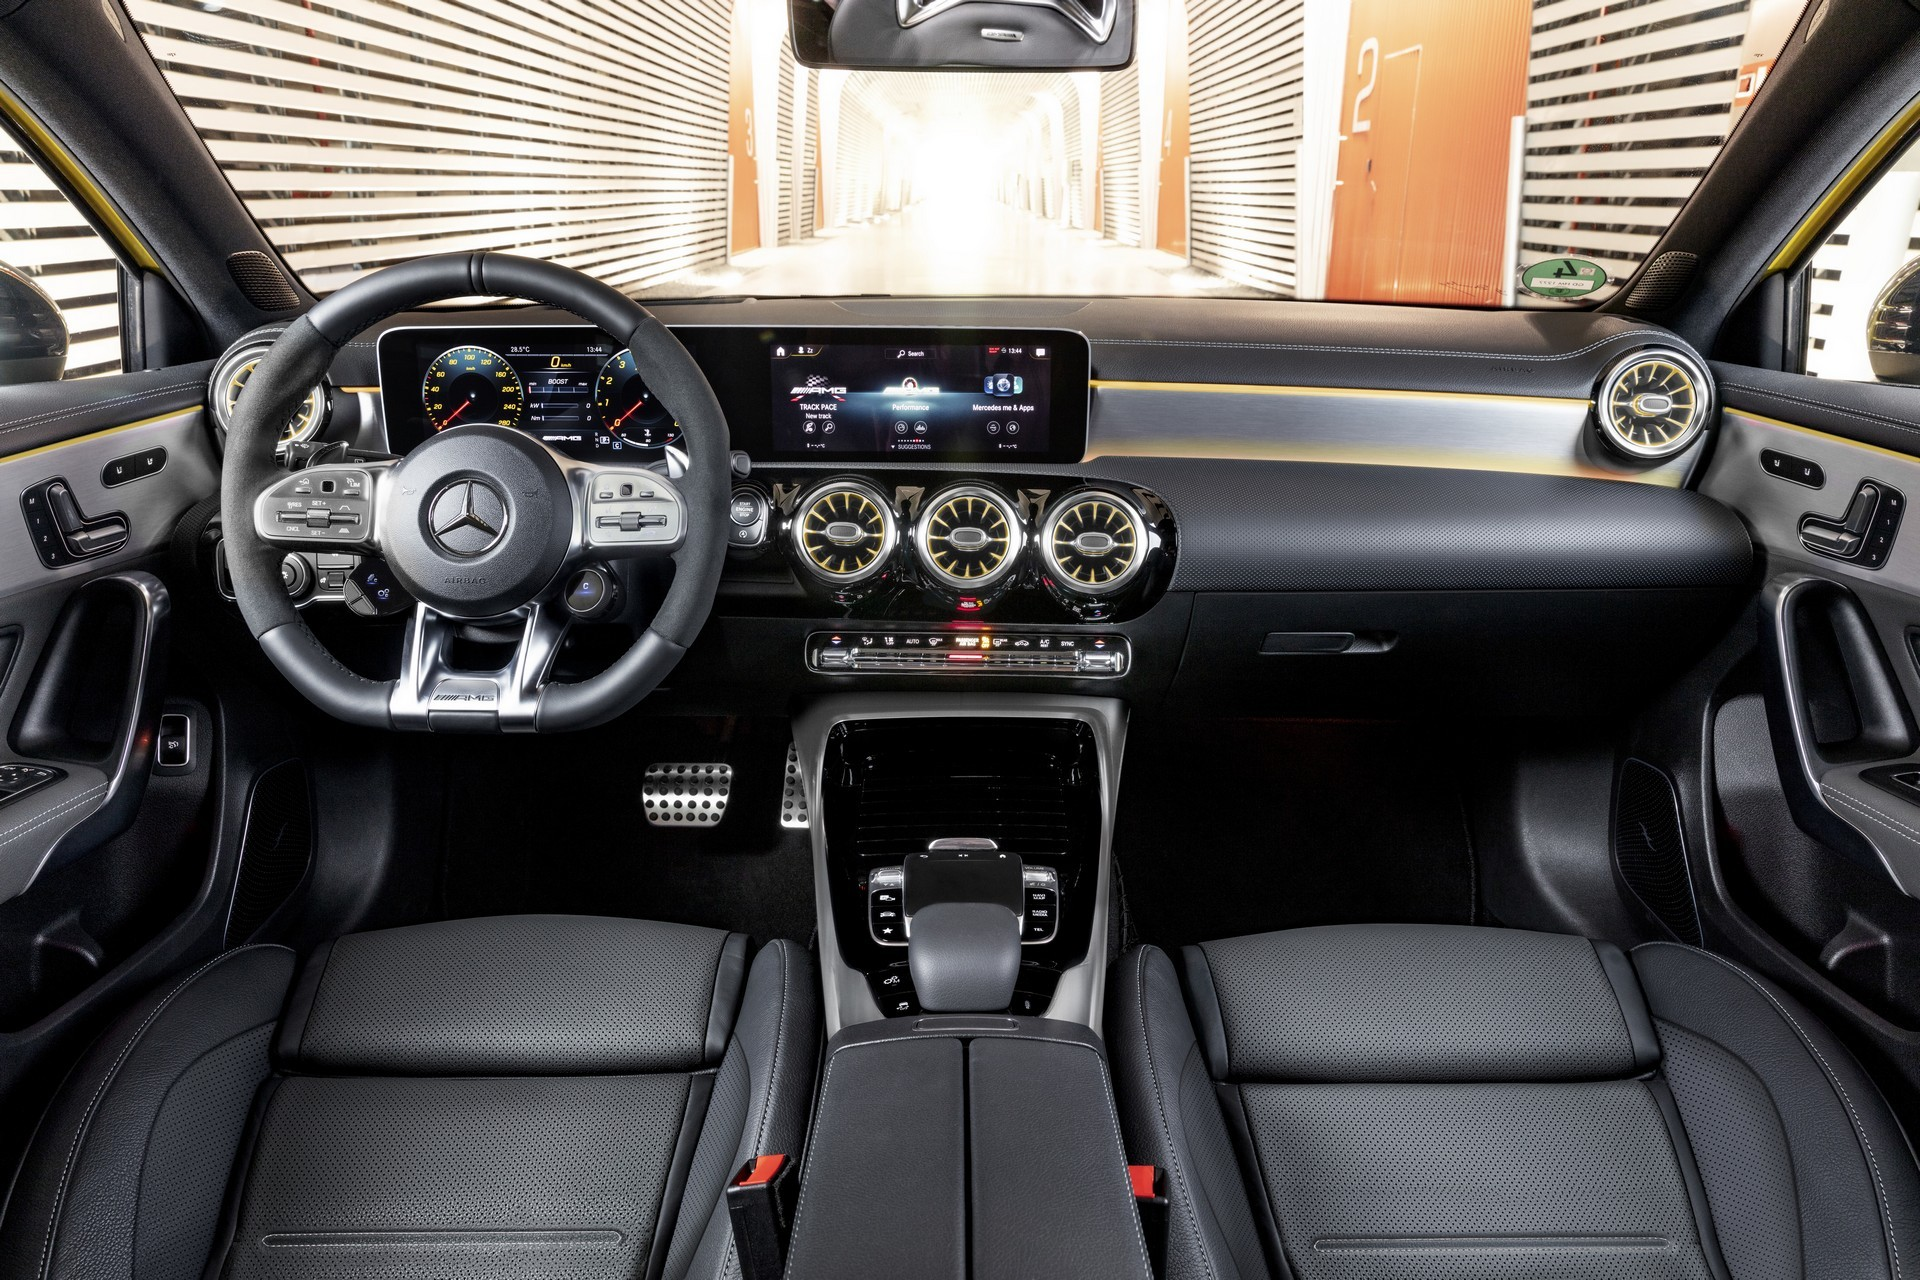 Mercedes A35 4MATIC AMG 2019